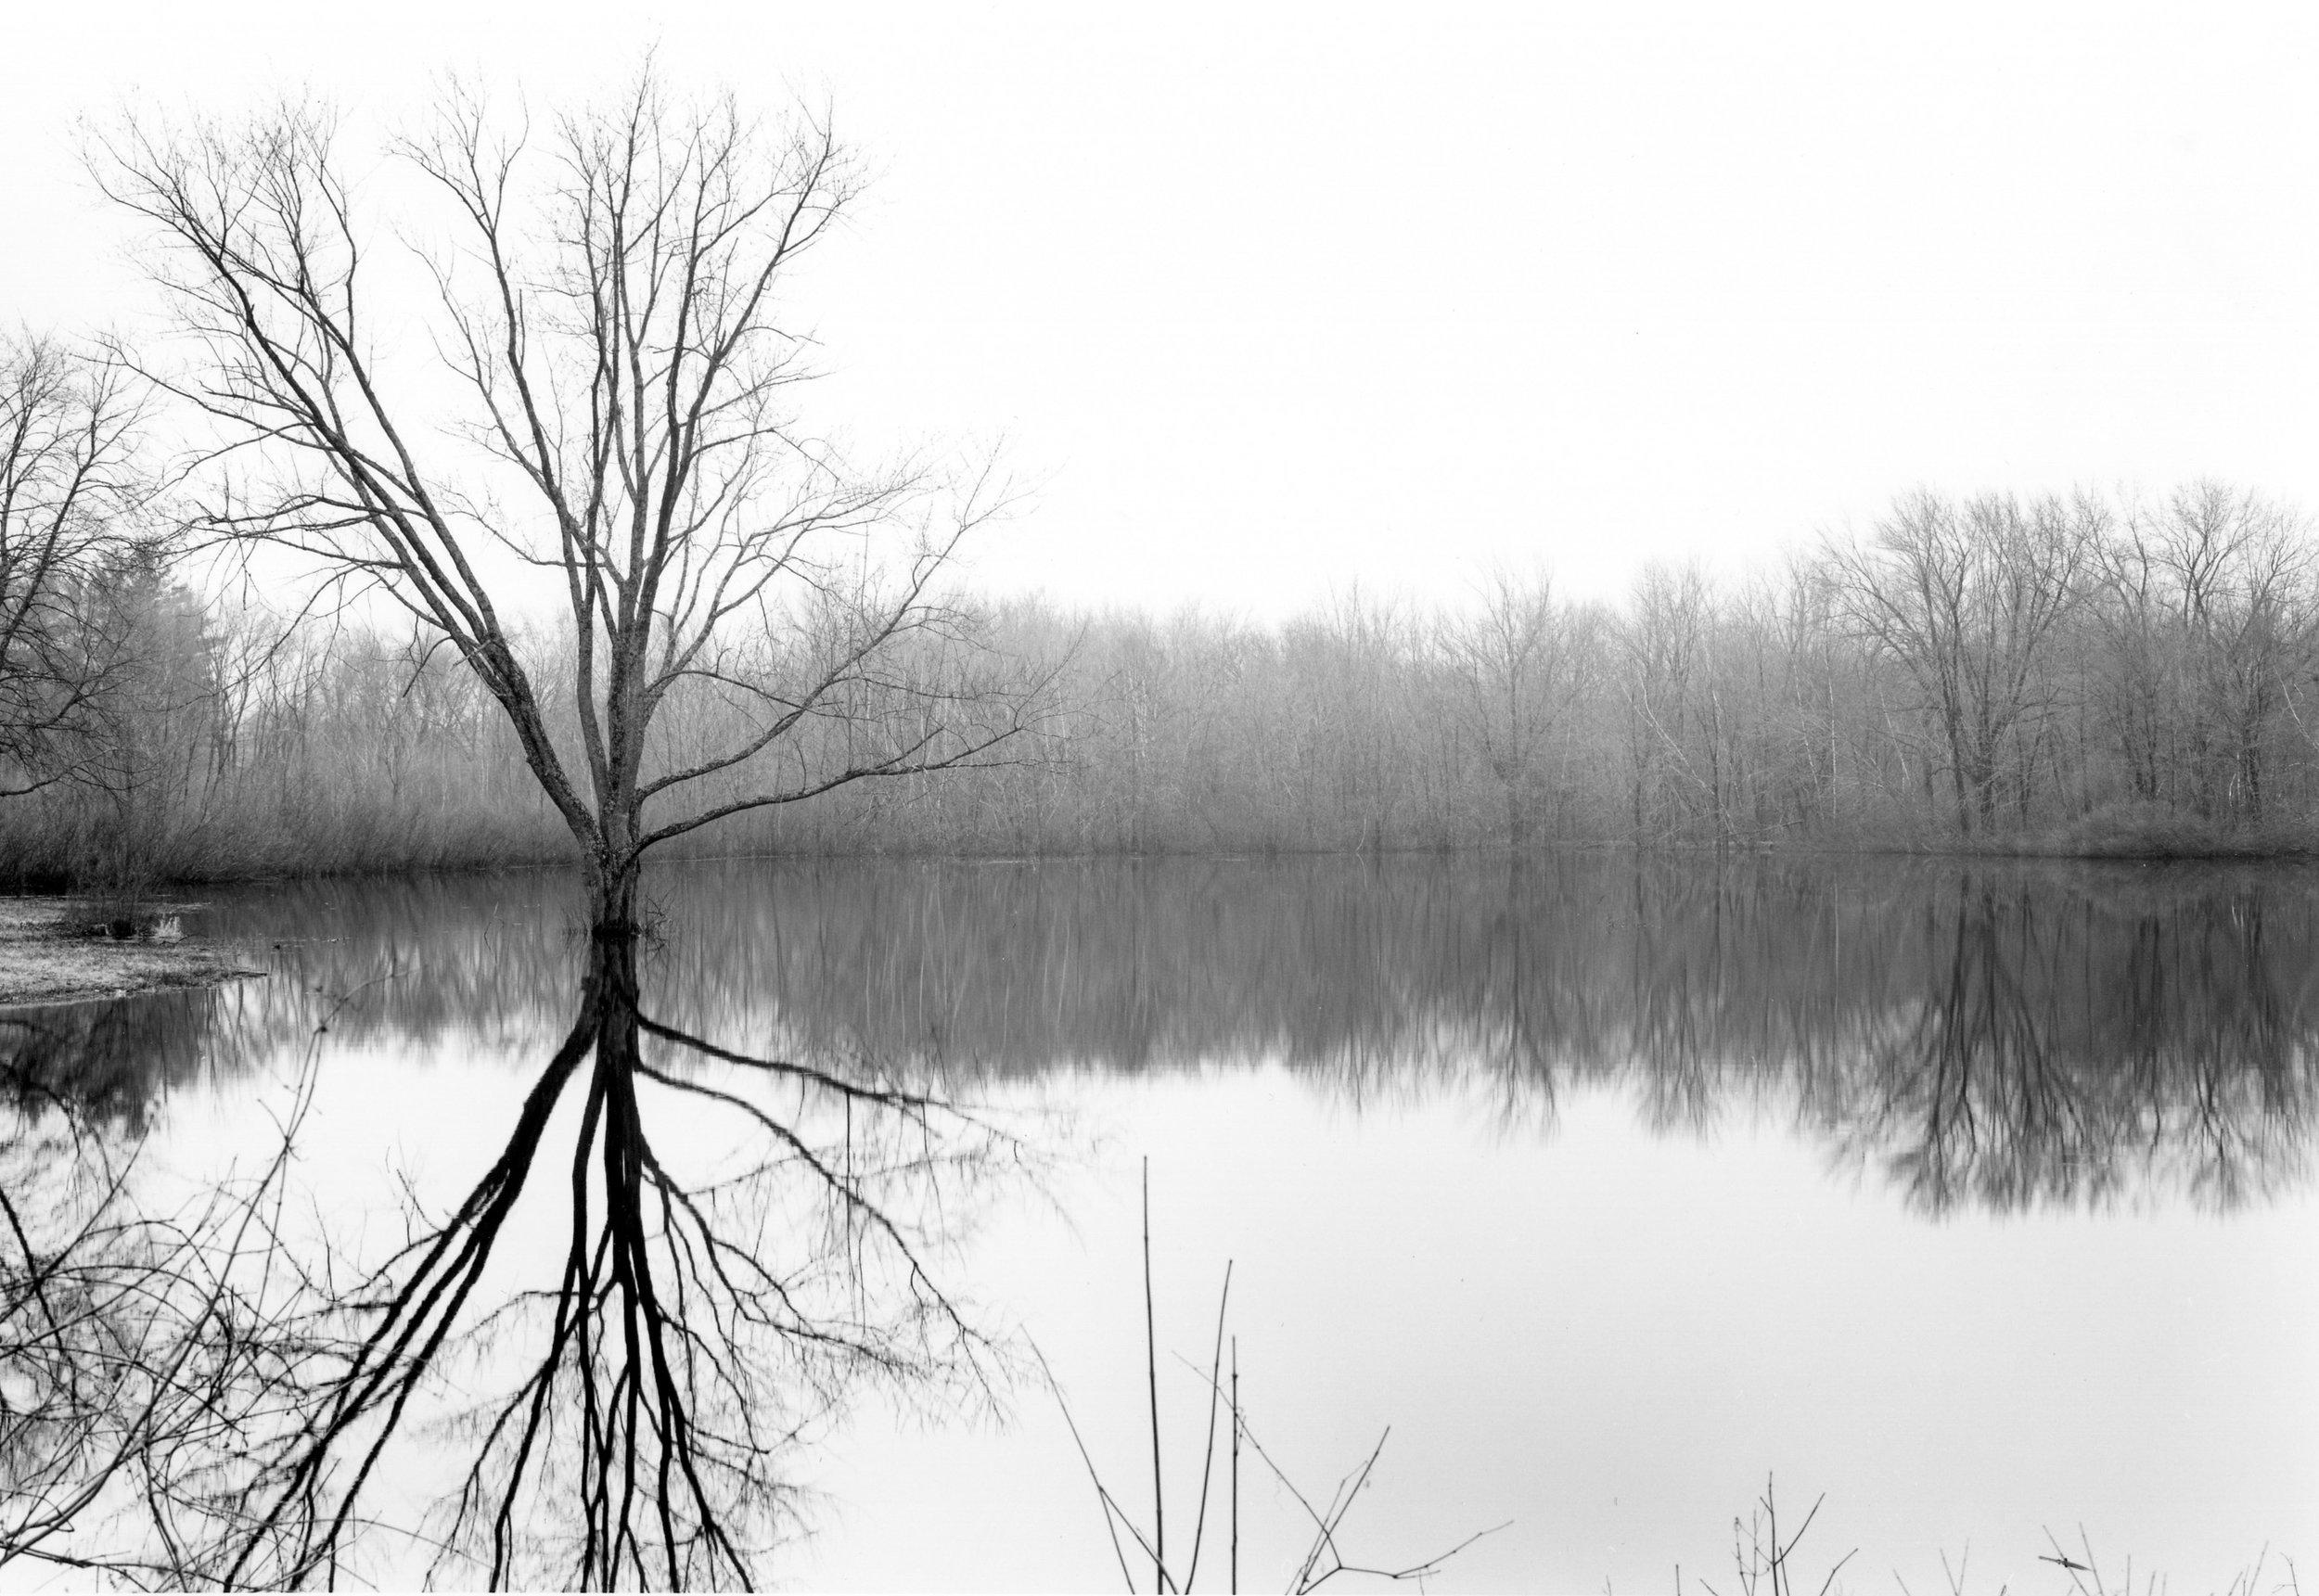 Calf Pasture Lake Concord, Massachusetts